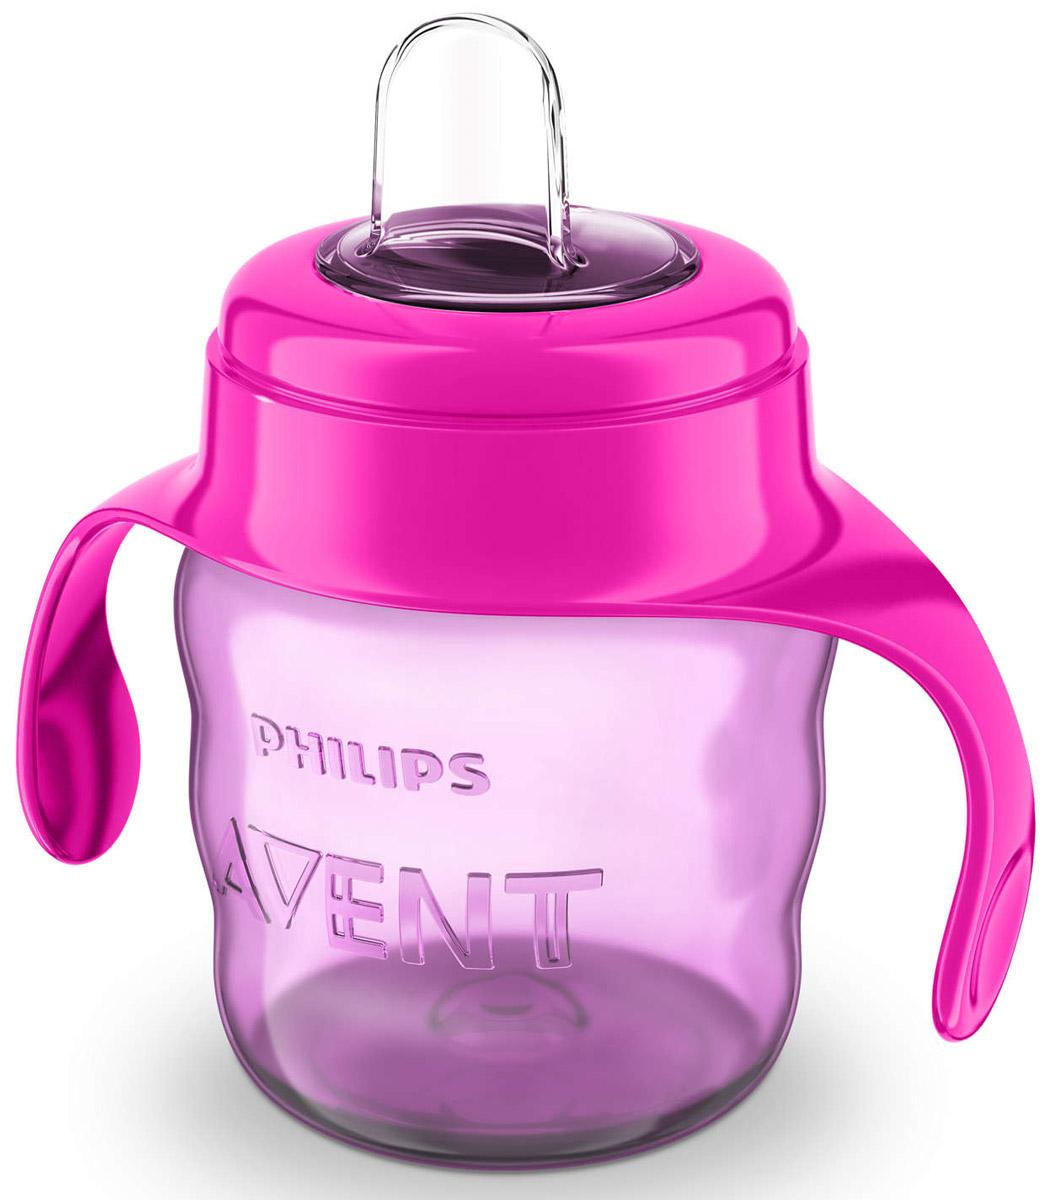 Philips Avent Чашка-поильник Comfort от 6 месяцев цвет фиолетовый фуксия 200 мл SCF551/00